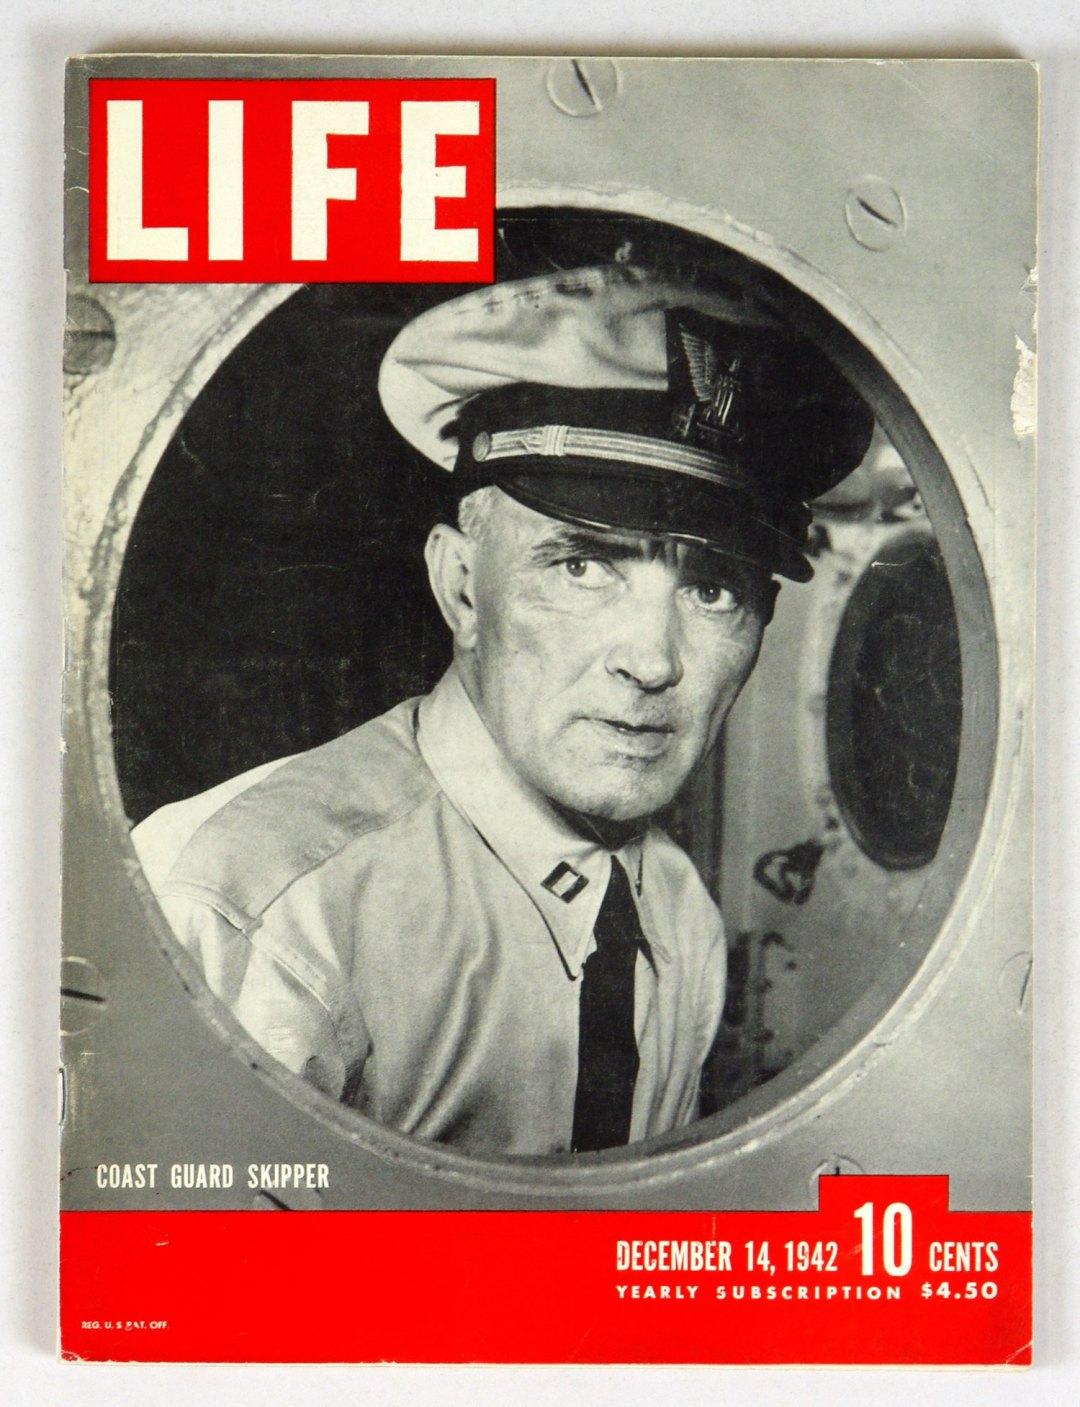 LIFE Magazine 1942 December 14 Coast Guard Skipper